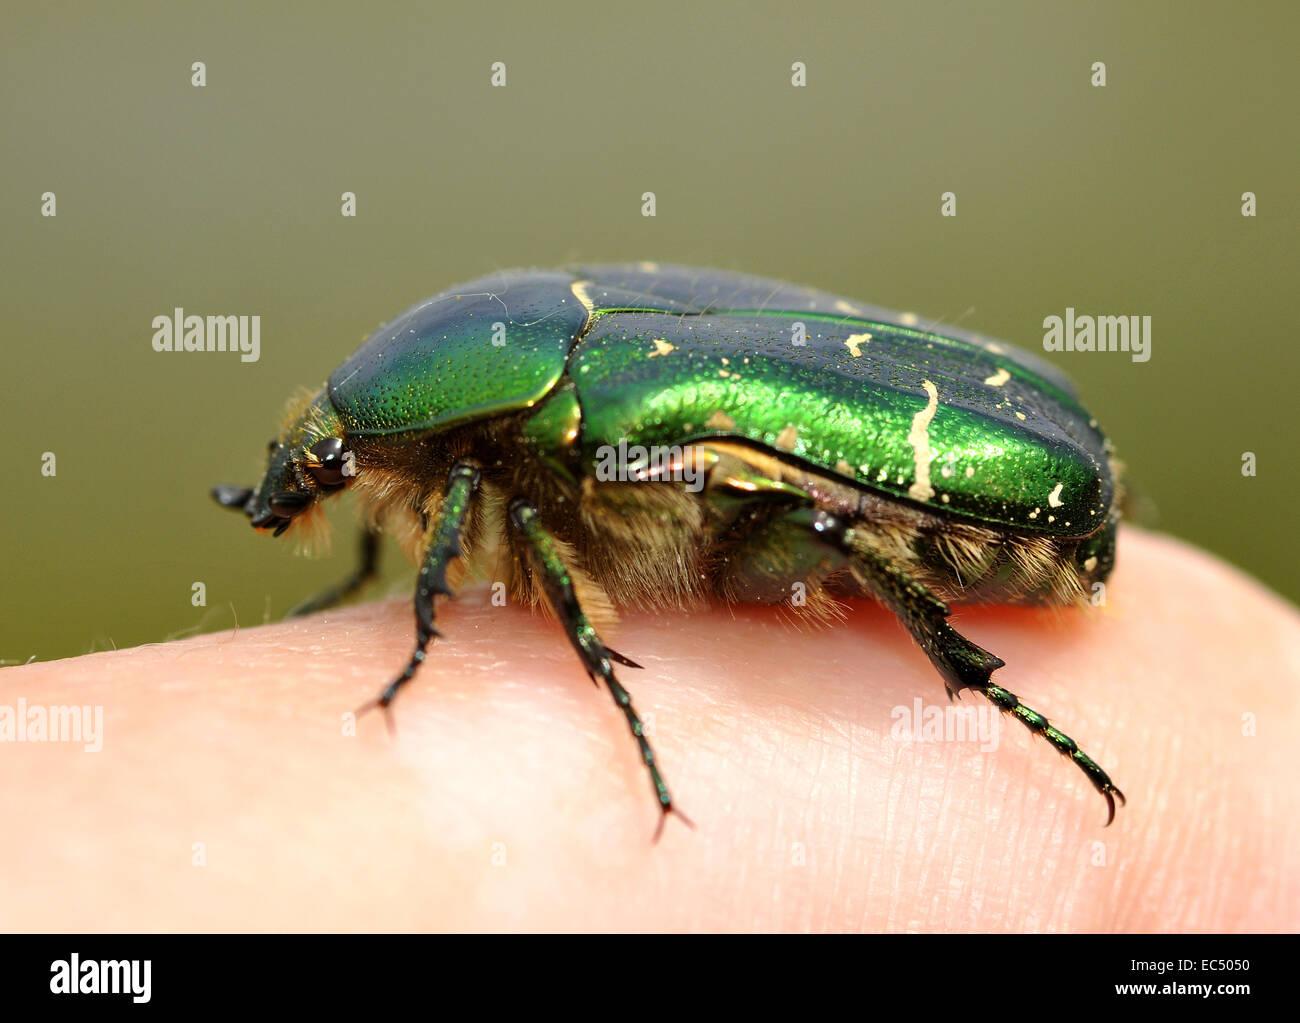 rose beetle - Stock Image